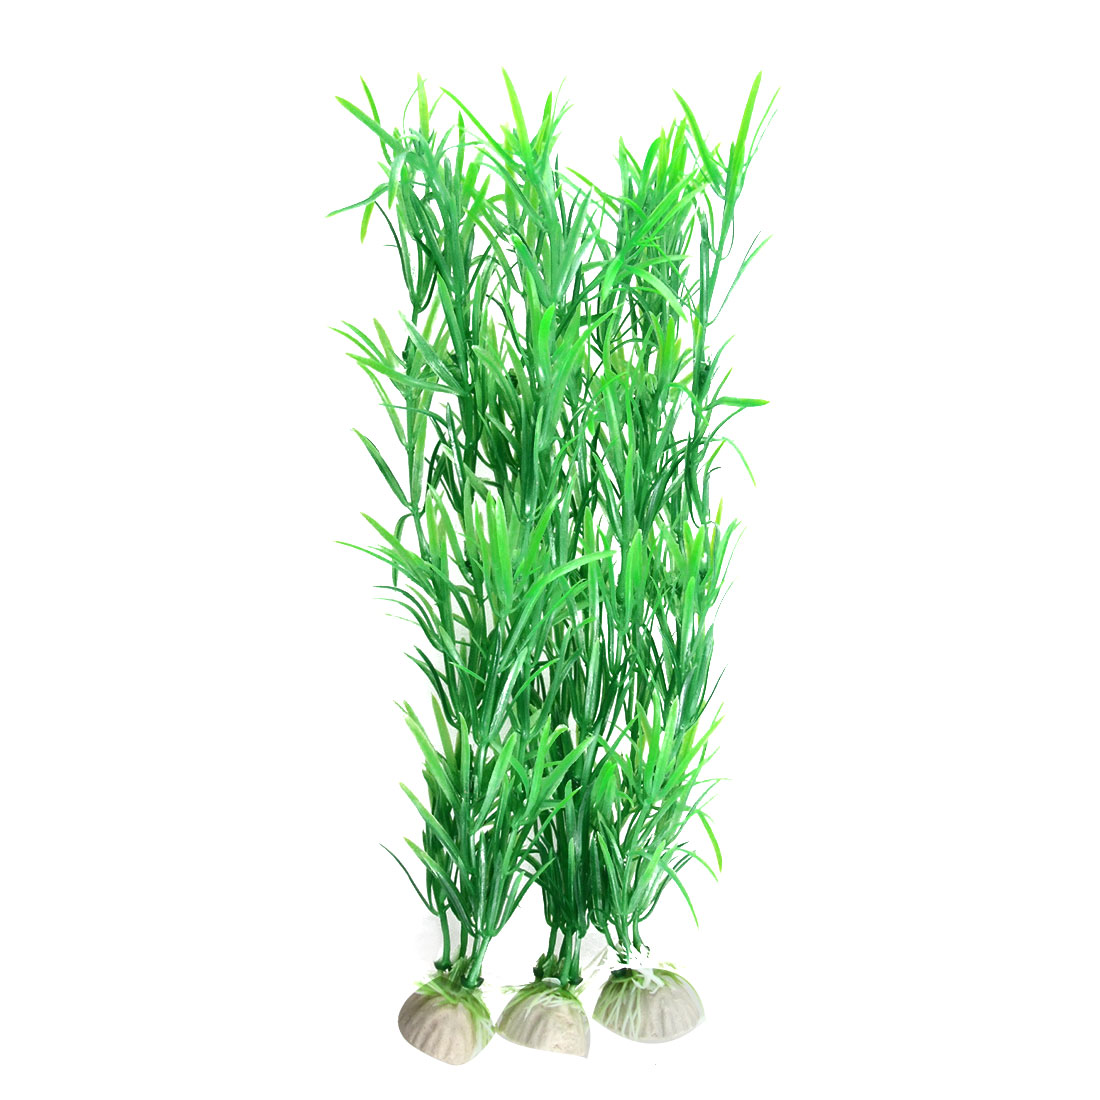 Aquarium Green Plastic Heteranthera Zosterifolia Grass